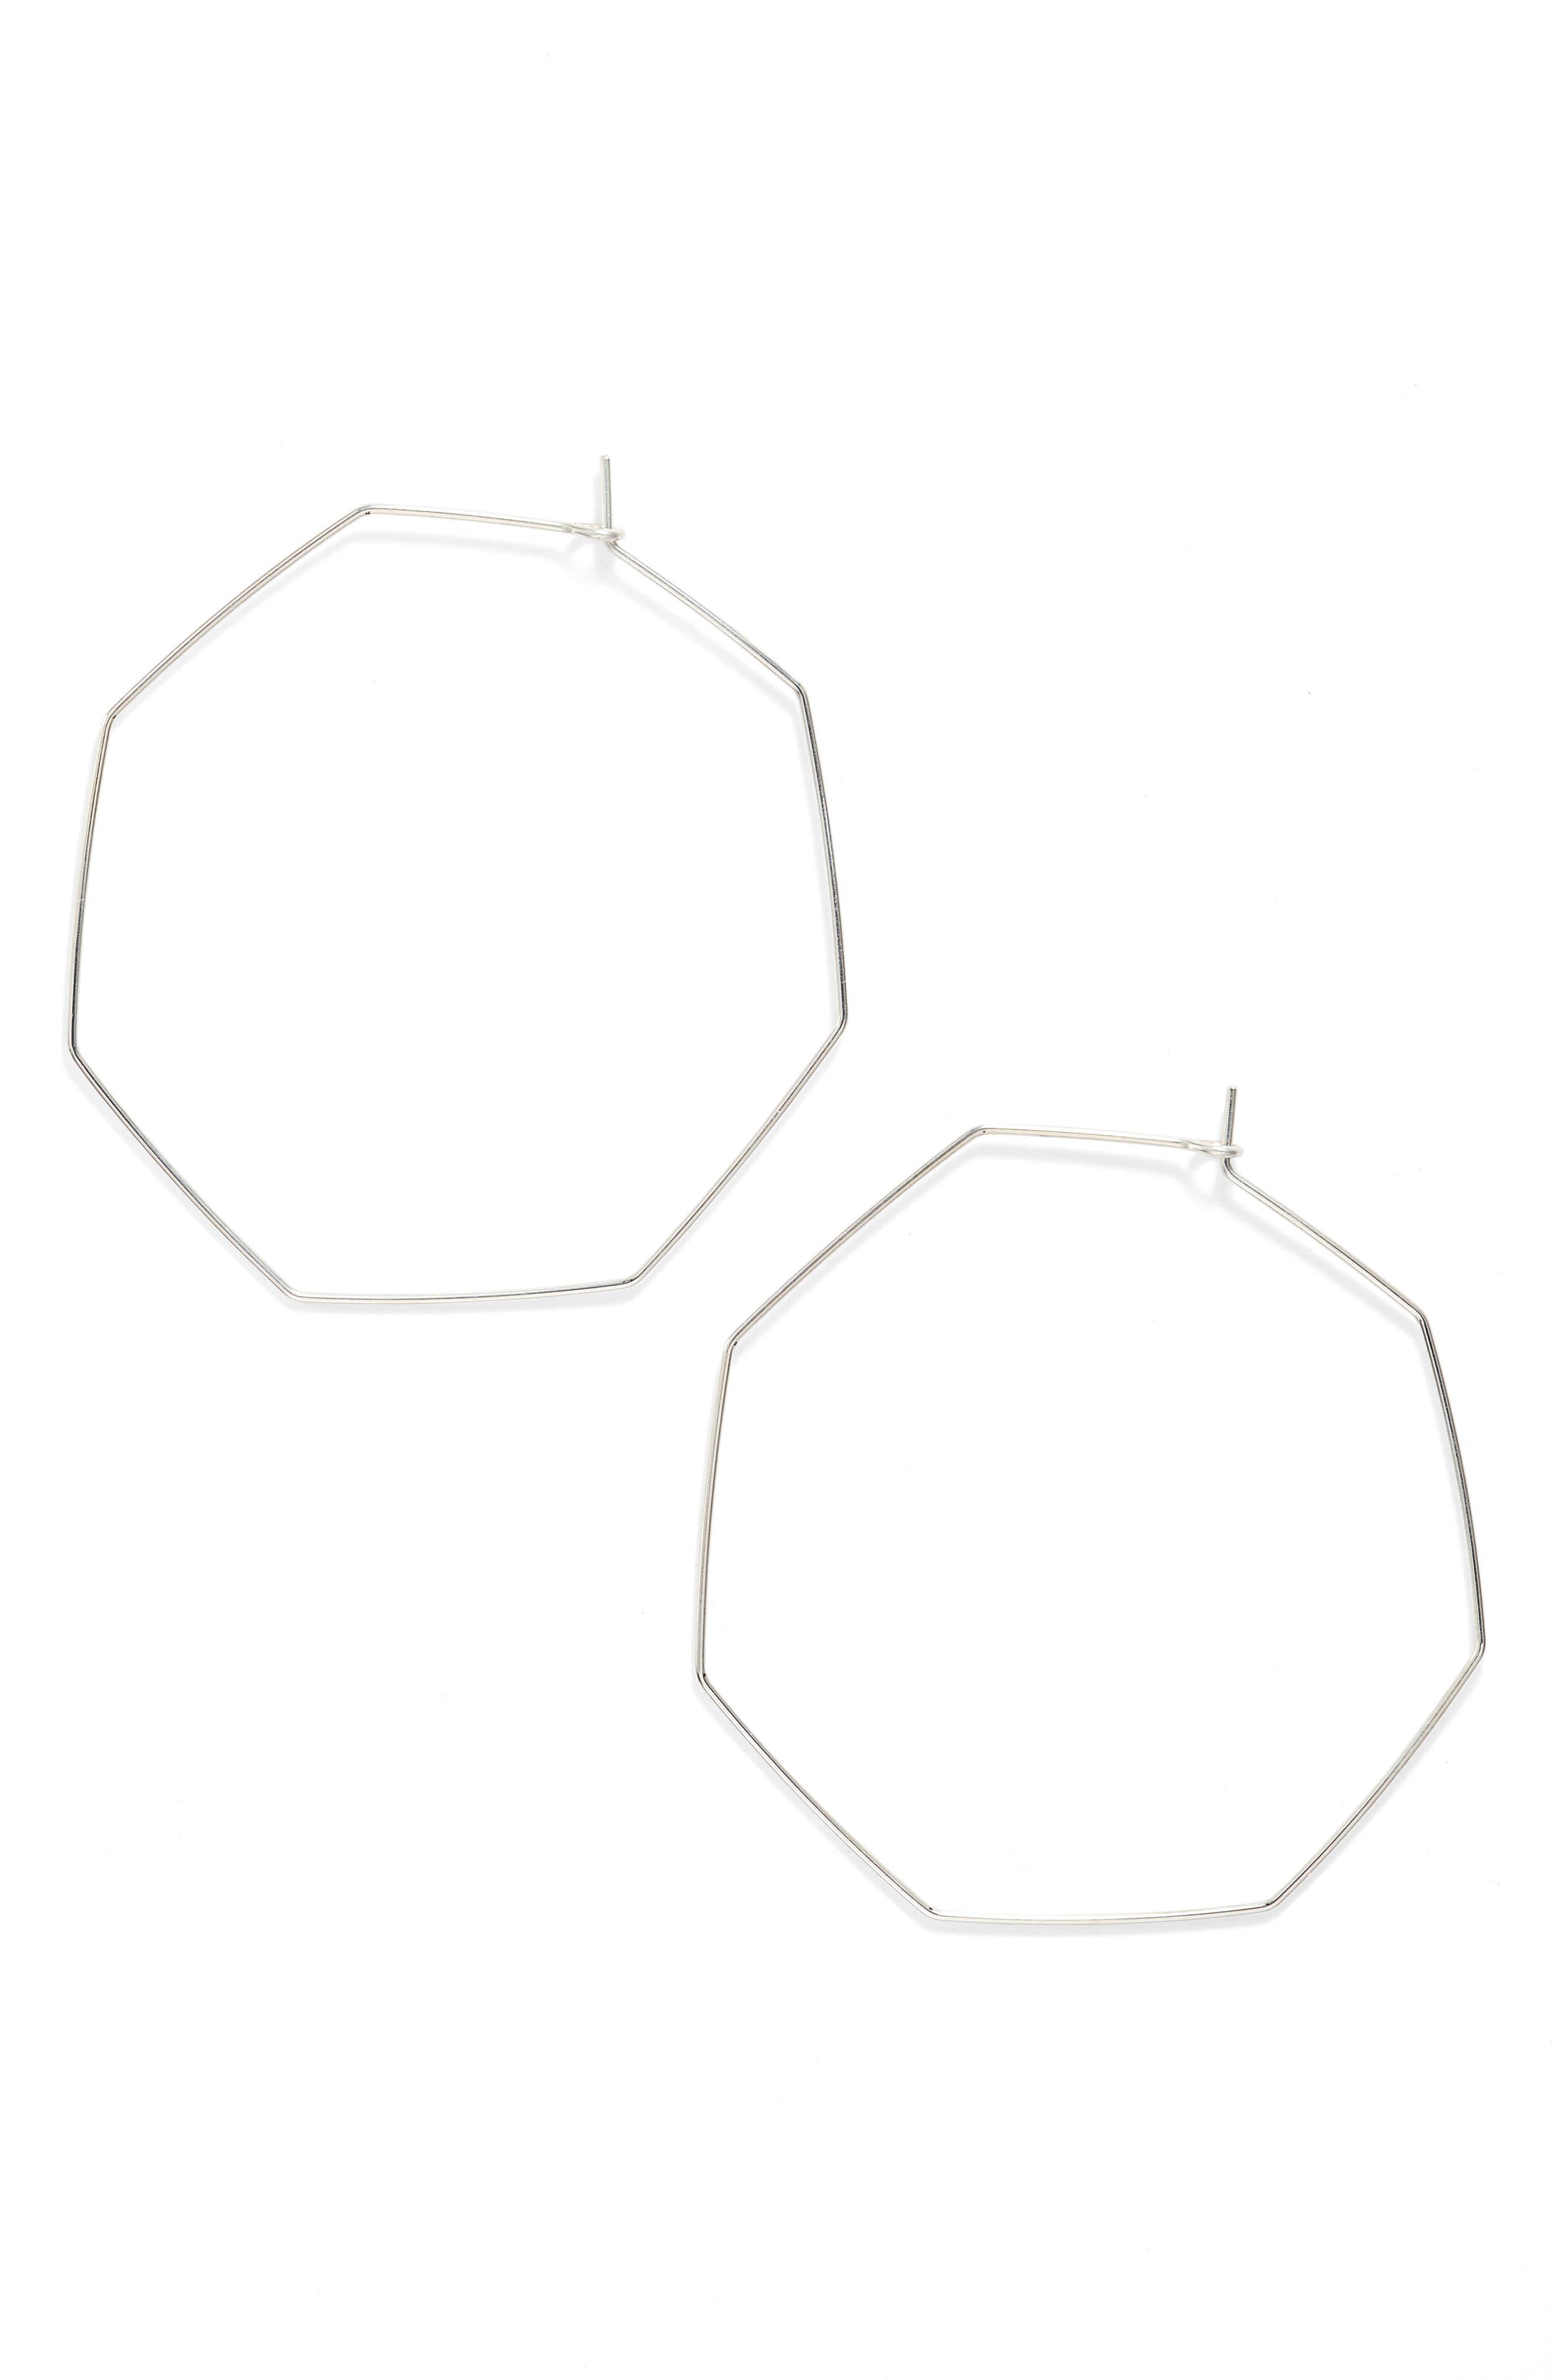 Octagon Hoop Earrings,                             Main thumbnail 1, color,                             SILVER